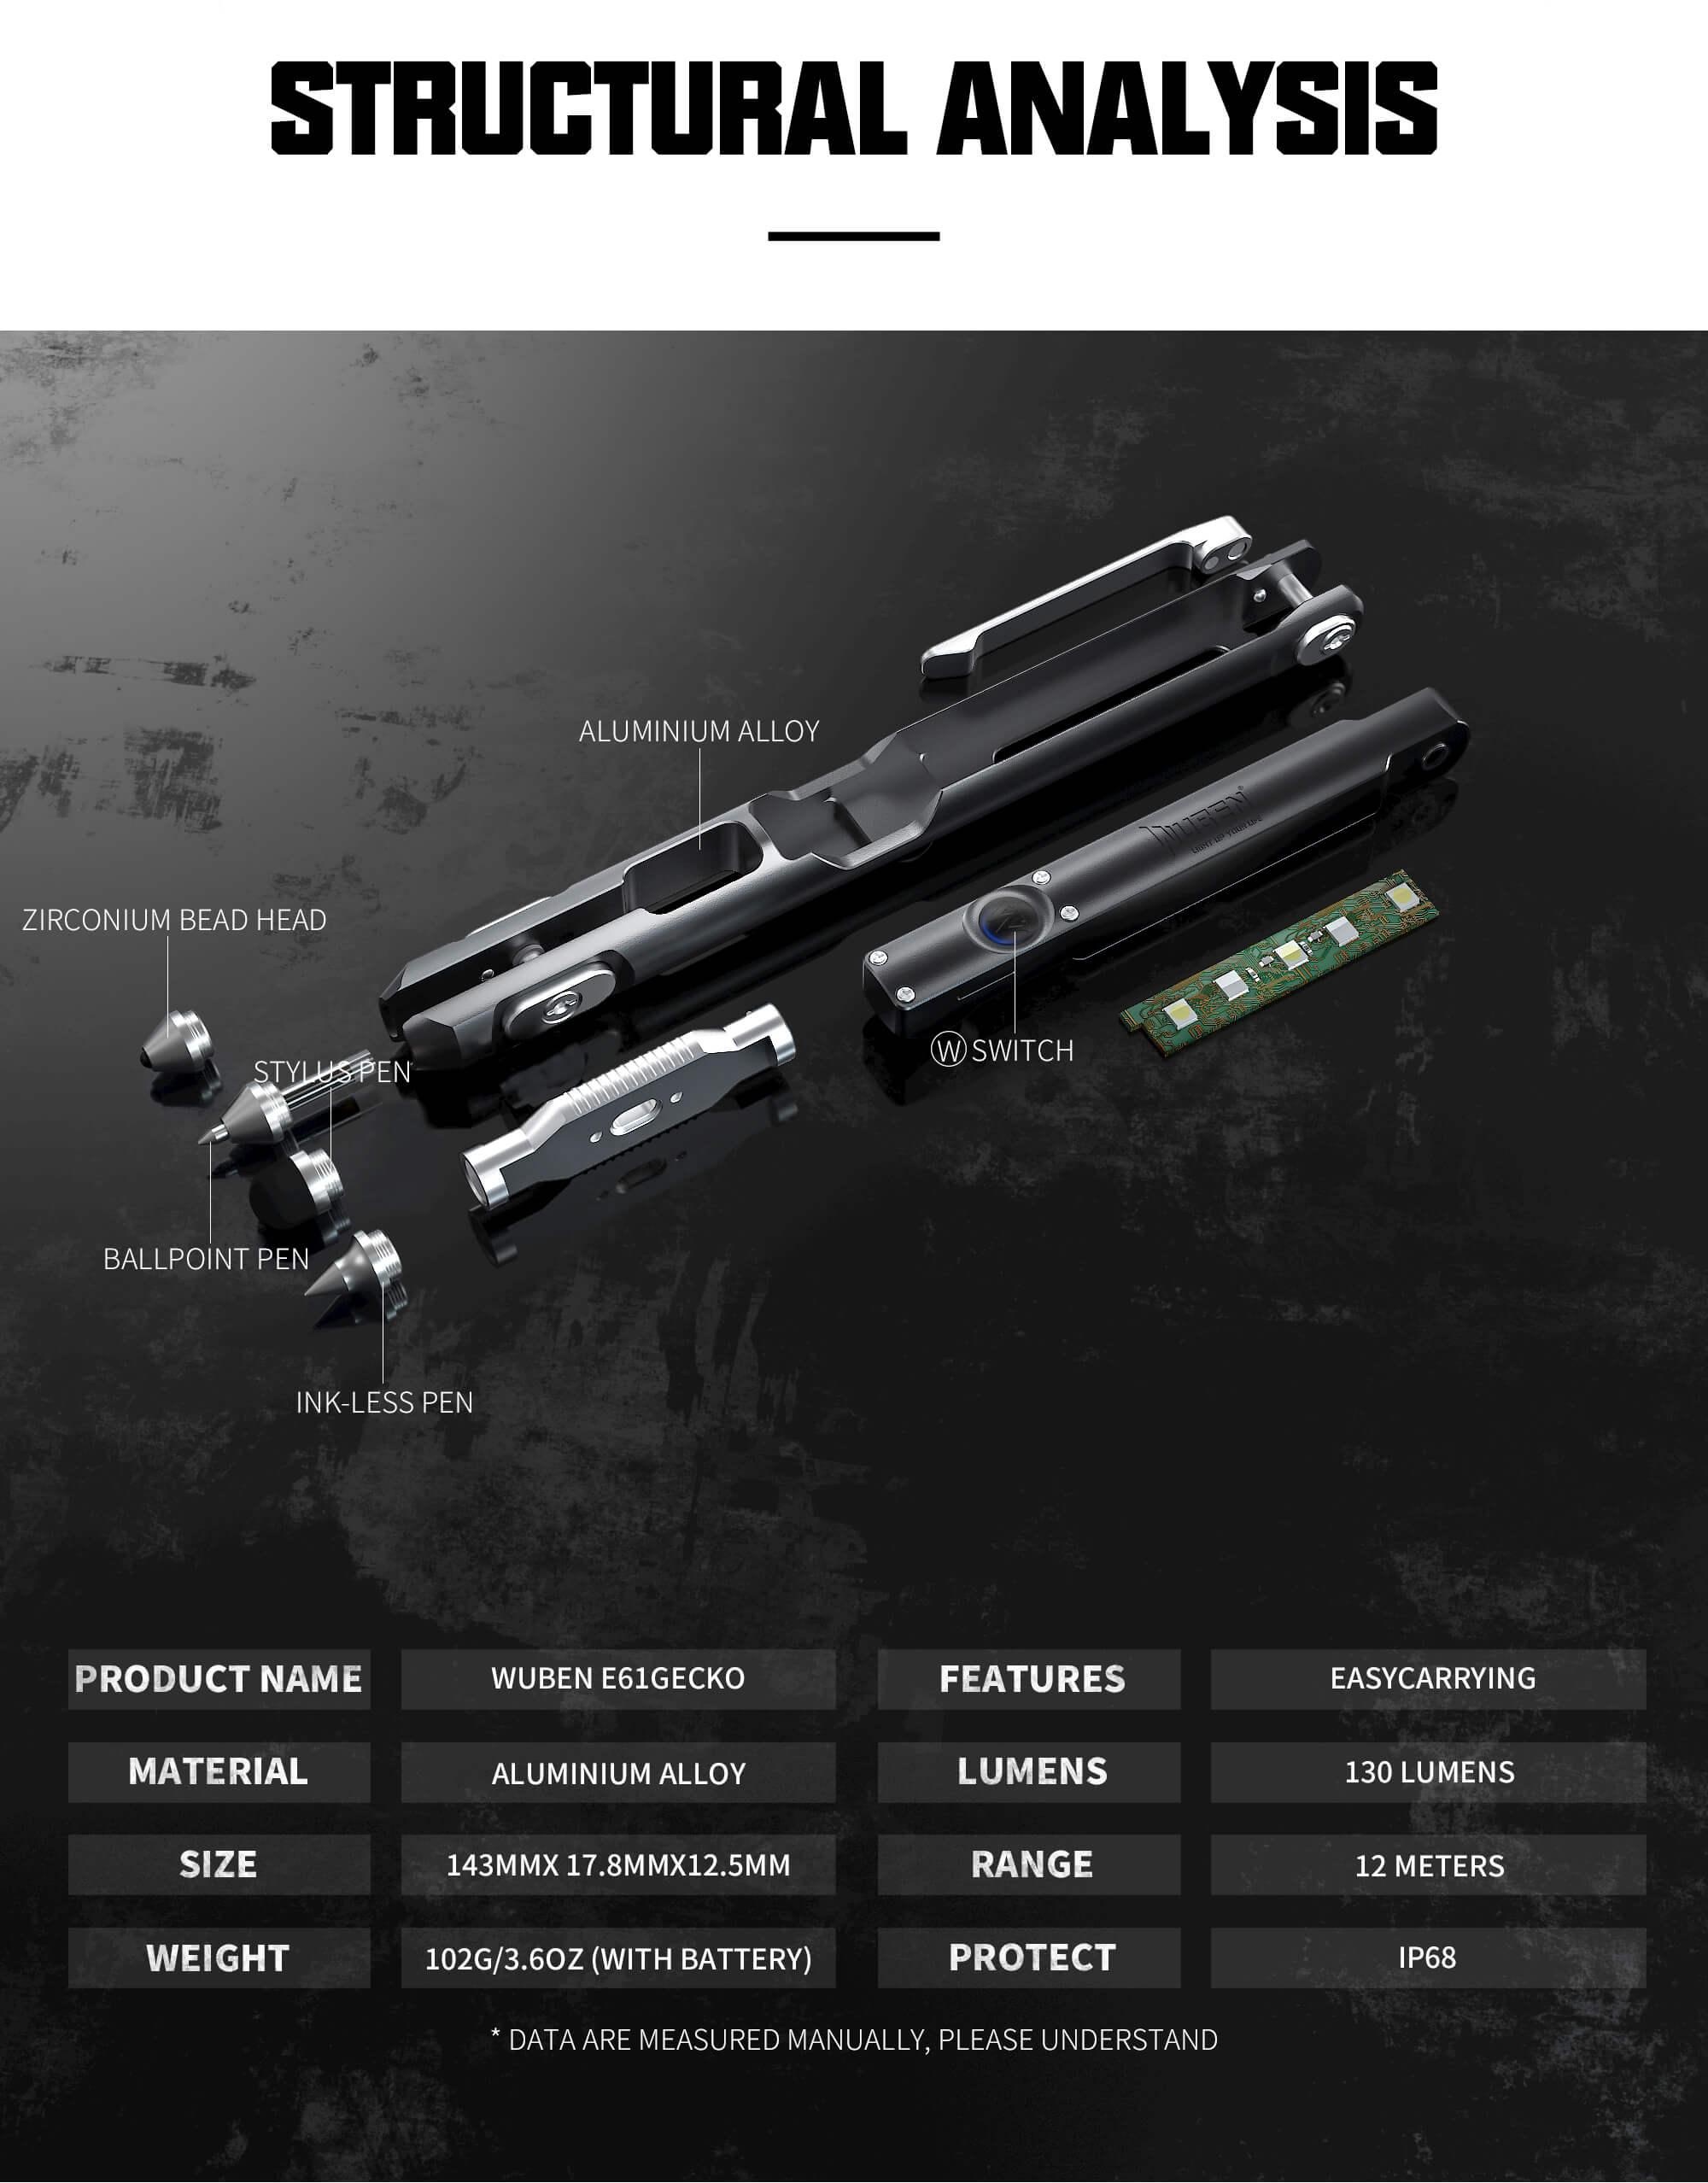 WUBEN Gecko E61 EDC Pen Rechargeable Multi-functional Cool Gadget Everyday Carry Penlight Flashlight 2021 Latest EDC Item enlarge